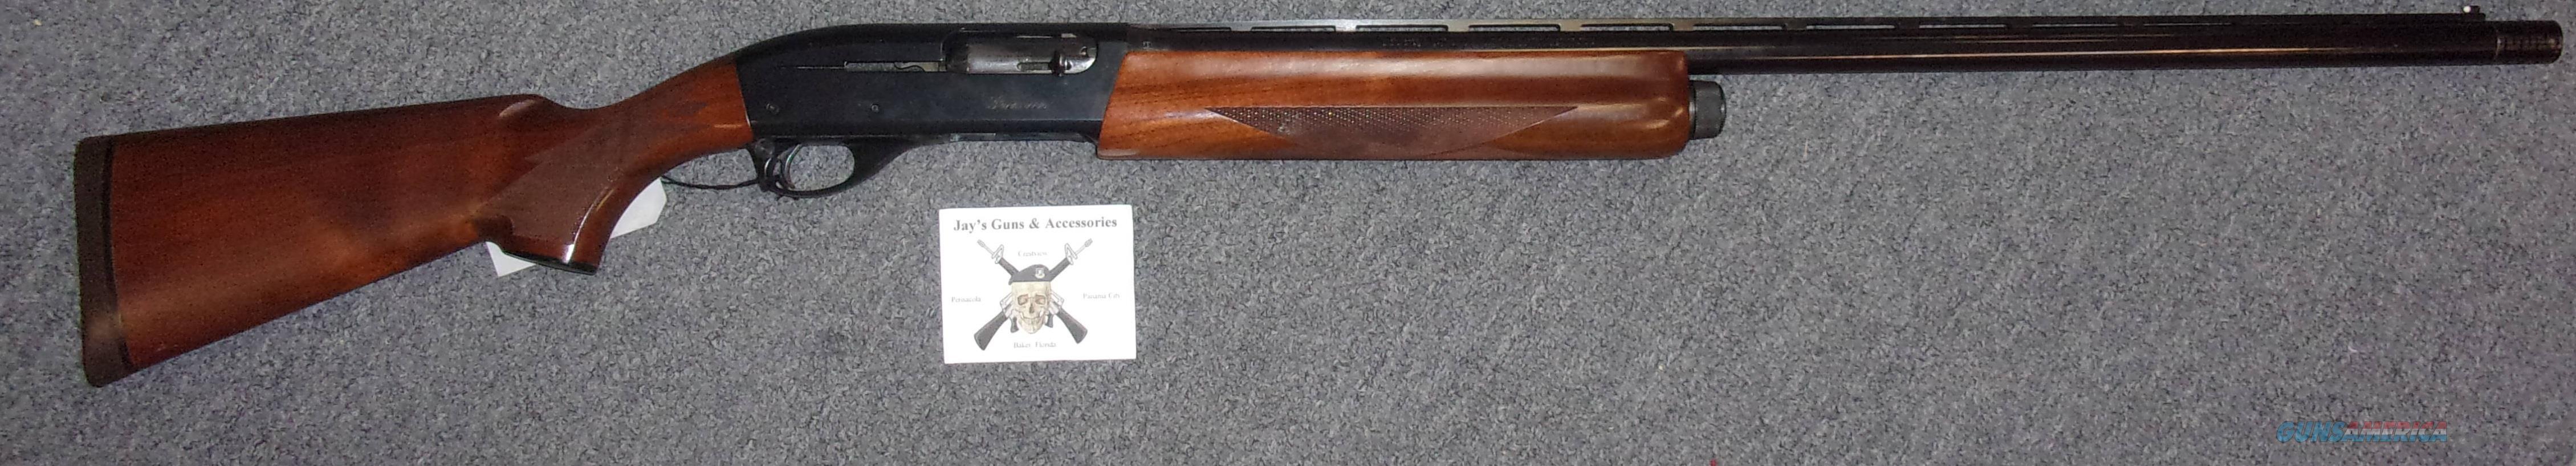 Remington 11-87  Guns > Shotguns > Remington Shotguns  > Autoloaders > Hunting